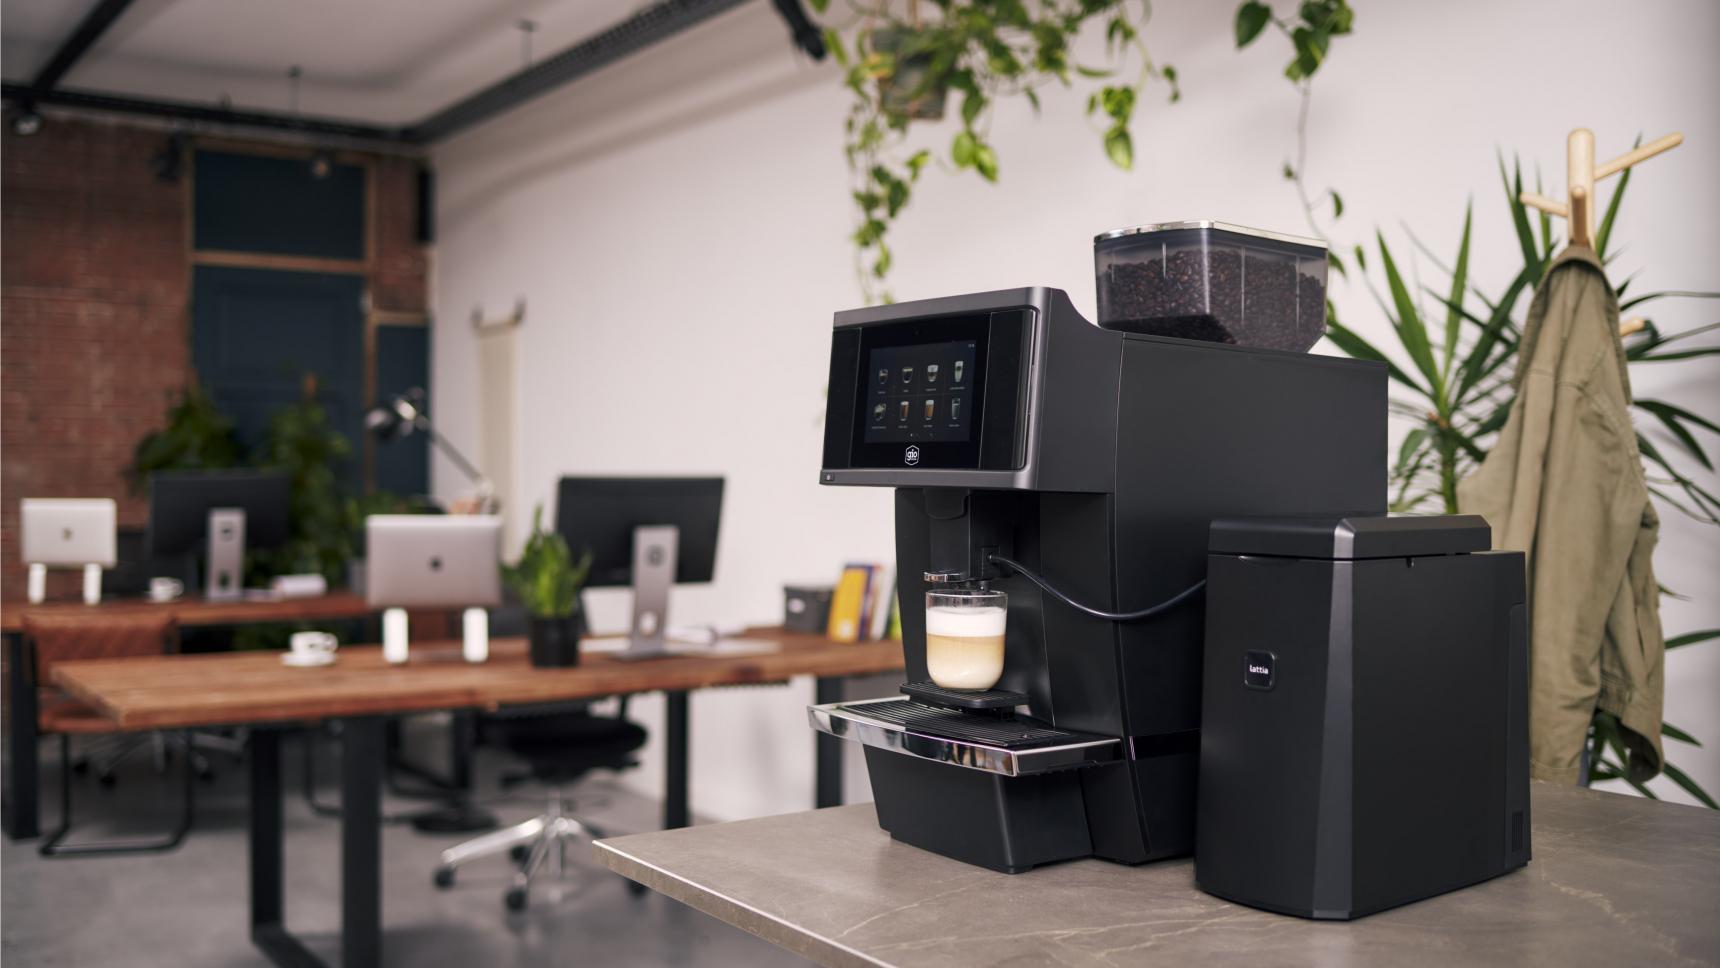 Gio Coffee Baristi 100 koffiebonenmachine in een kantoor